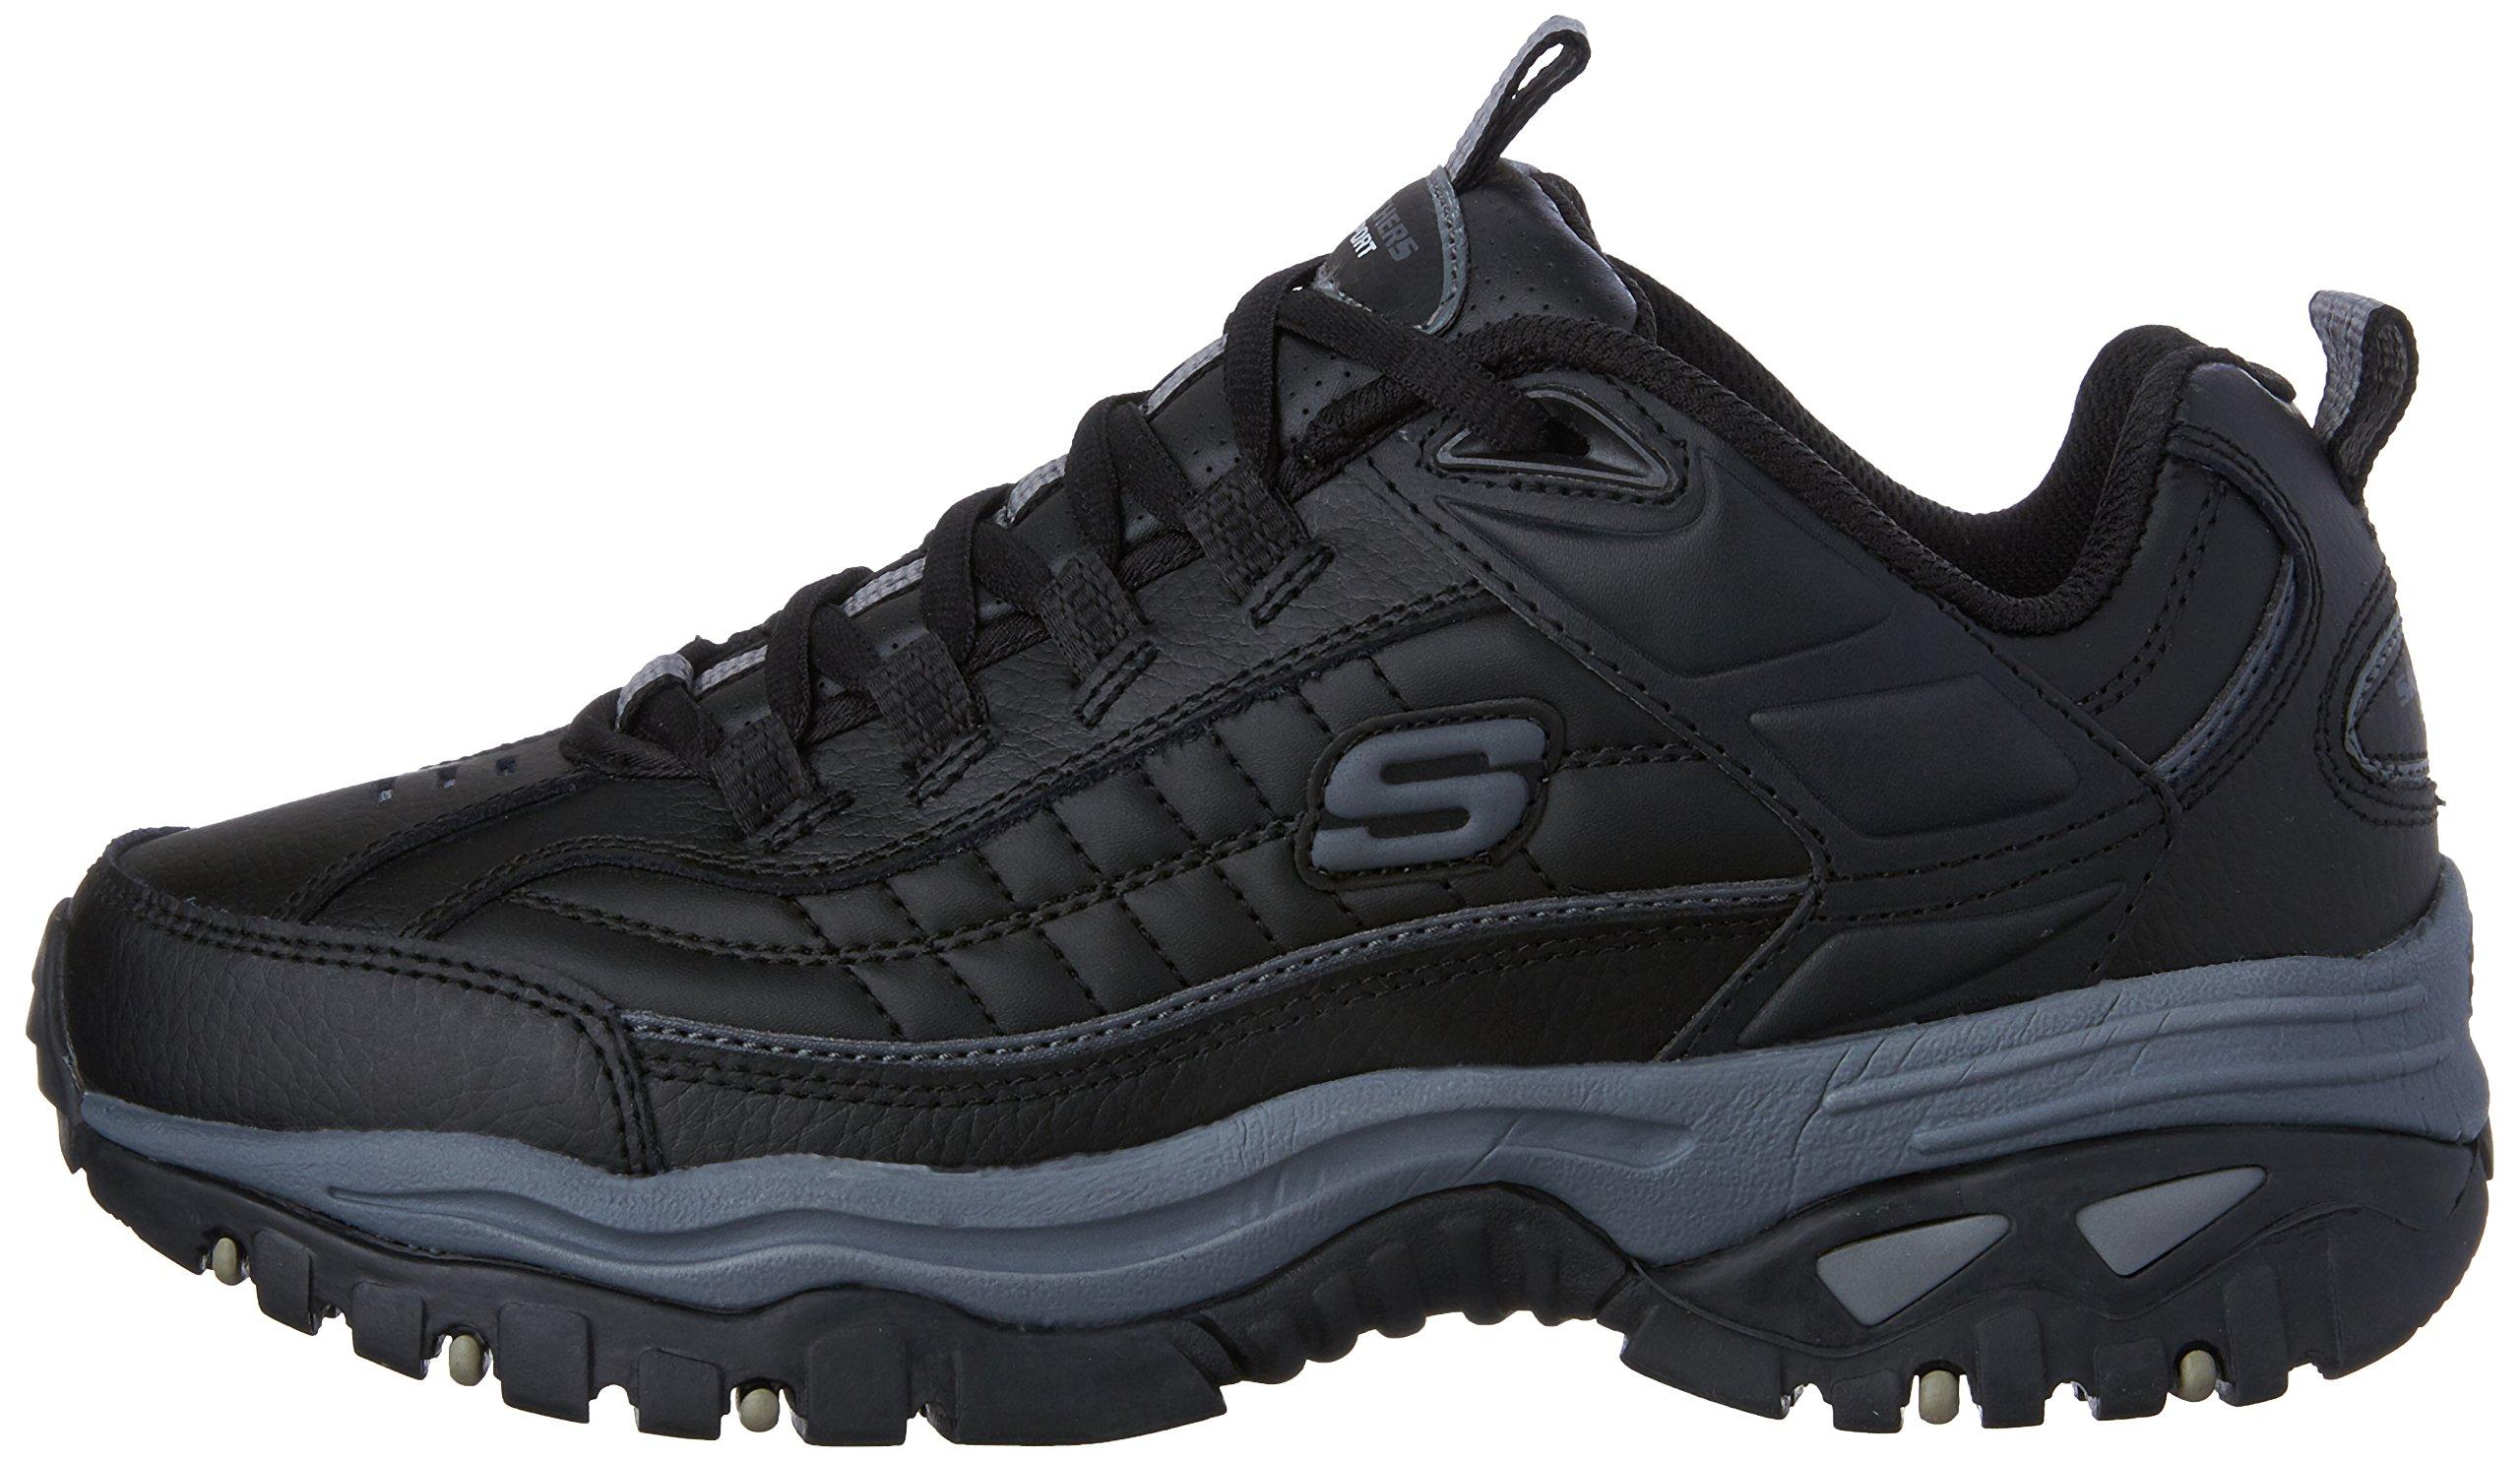 Skechers Men's Energy Afterburn Lace-Up Sneaker,Black/Gray,14 M US by Skechers (Image #5)